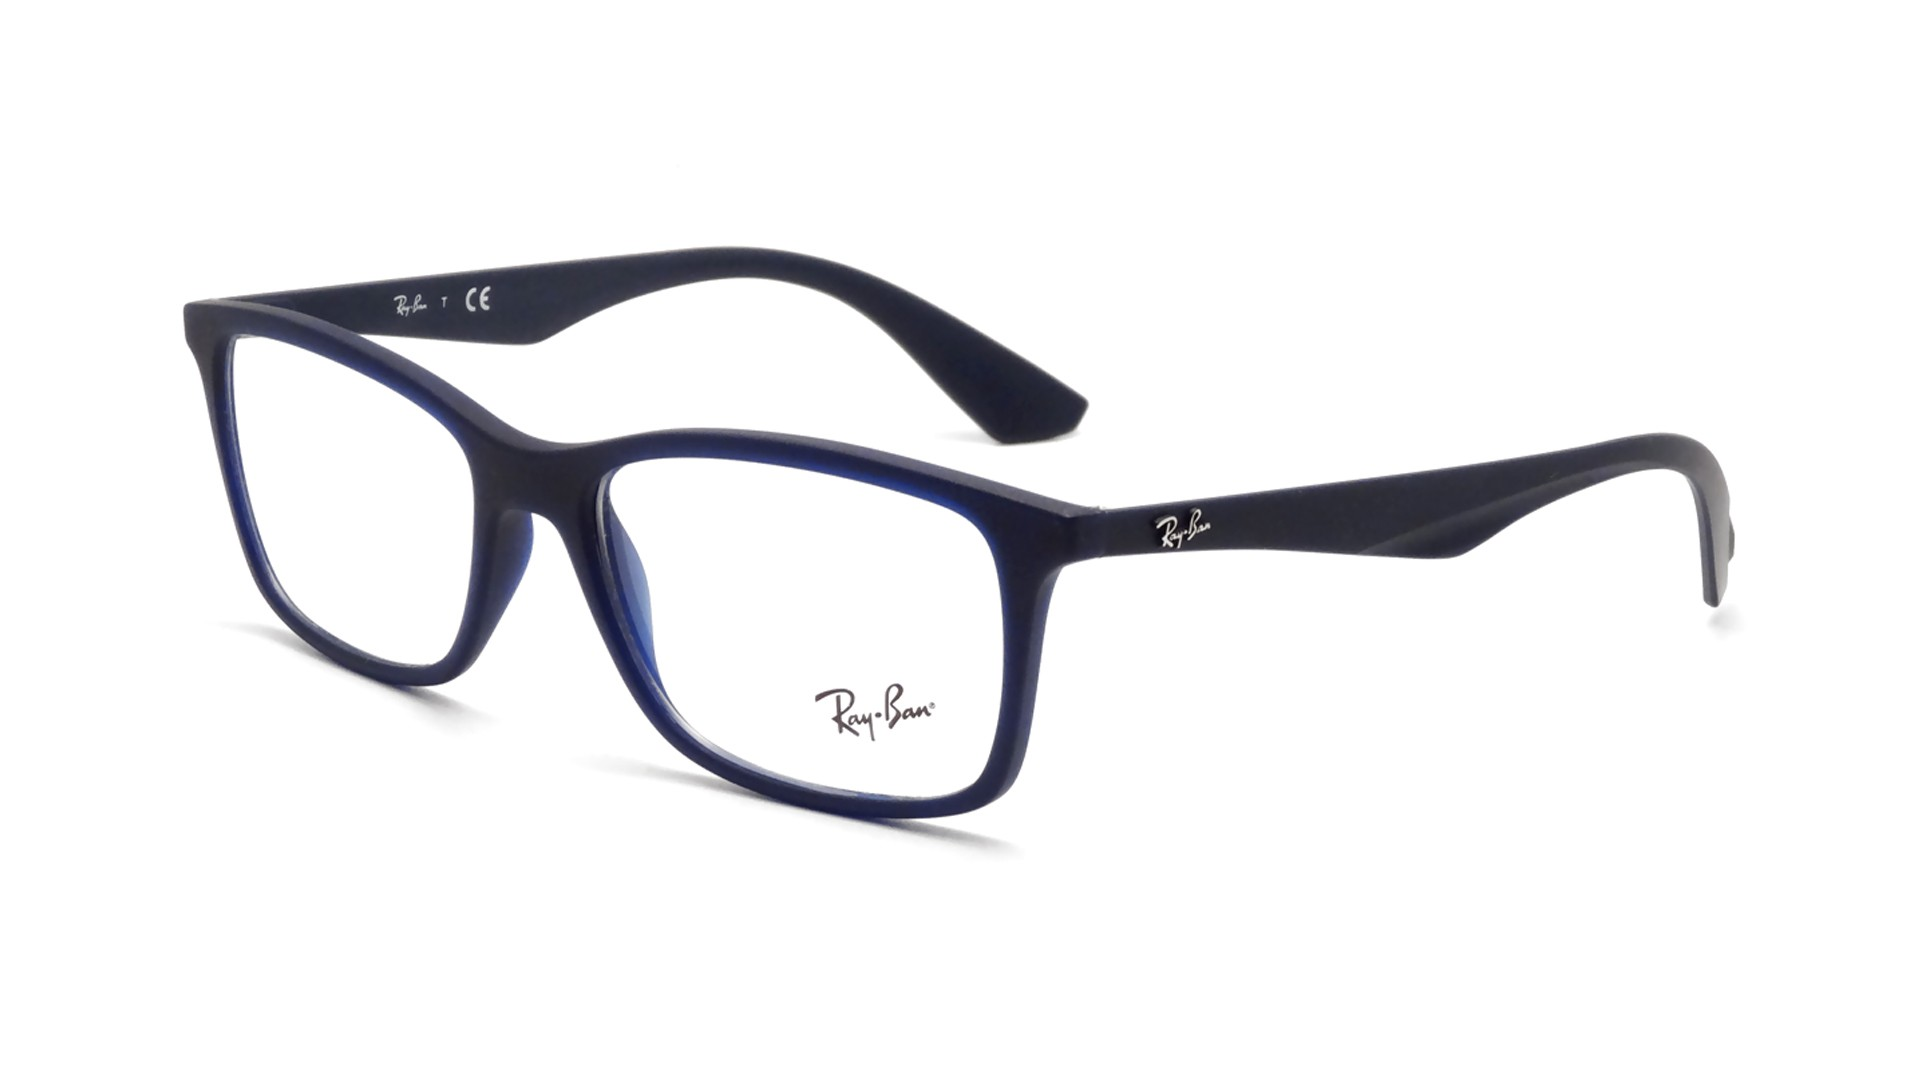 Rayban Blue Eyeglass Frames